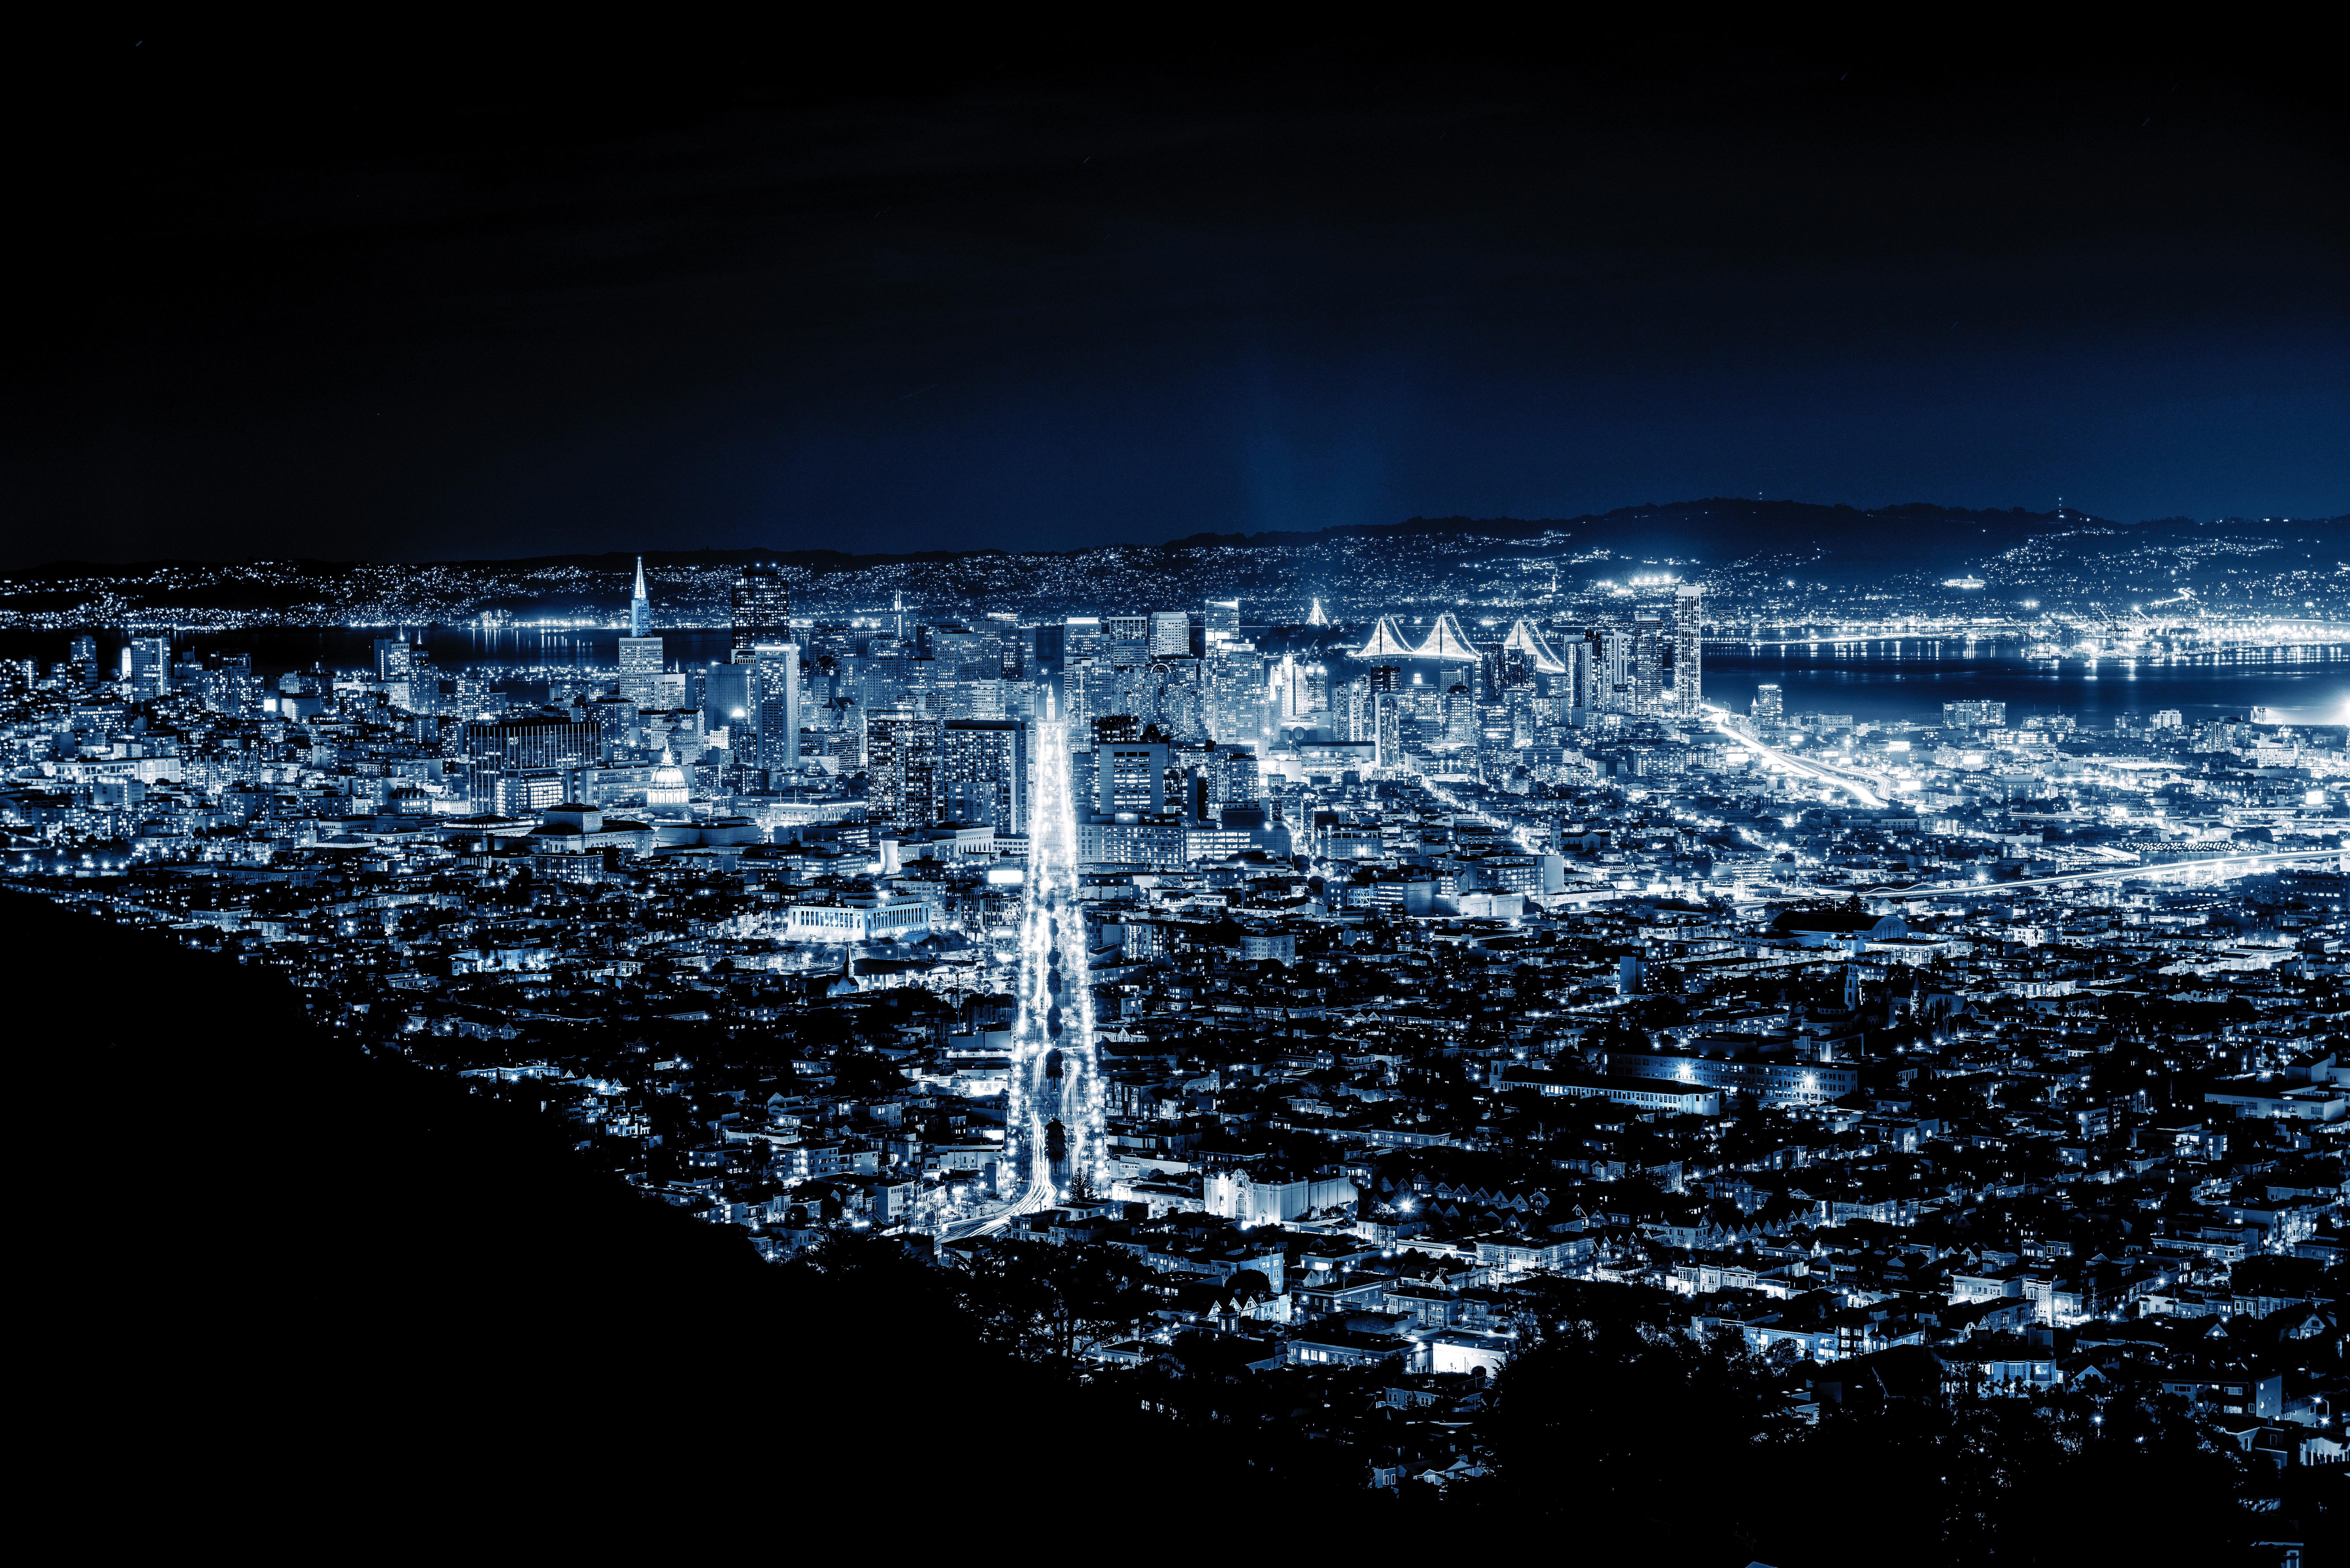 San Francisco Night 8k Hd World 4k Wallpapers Images